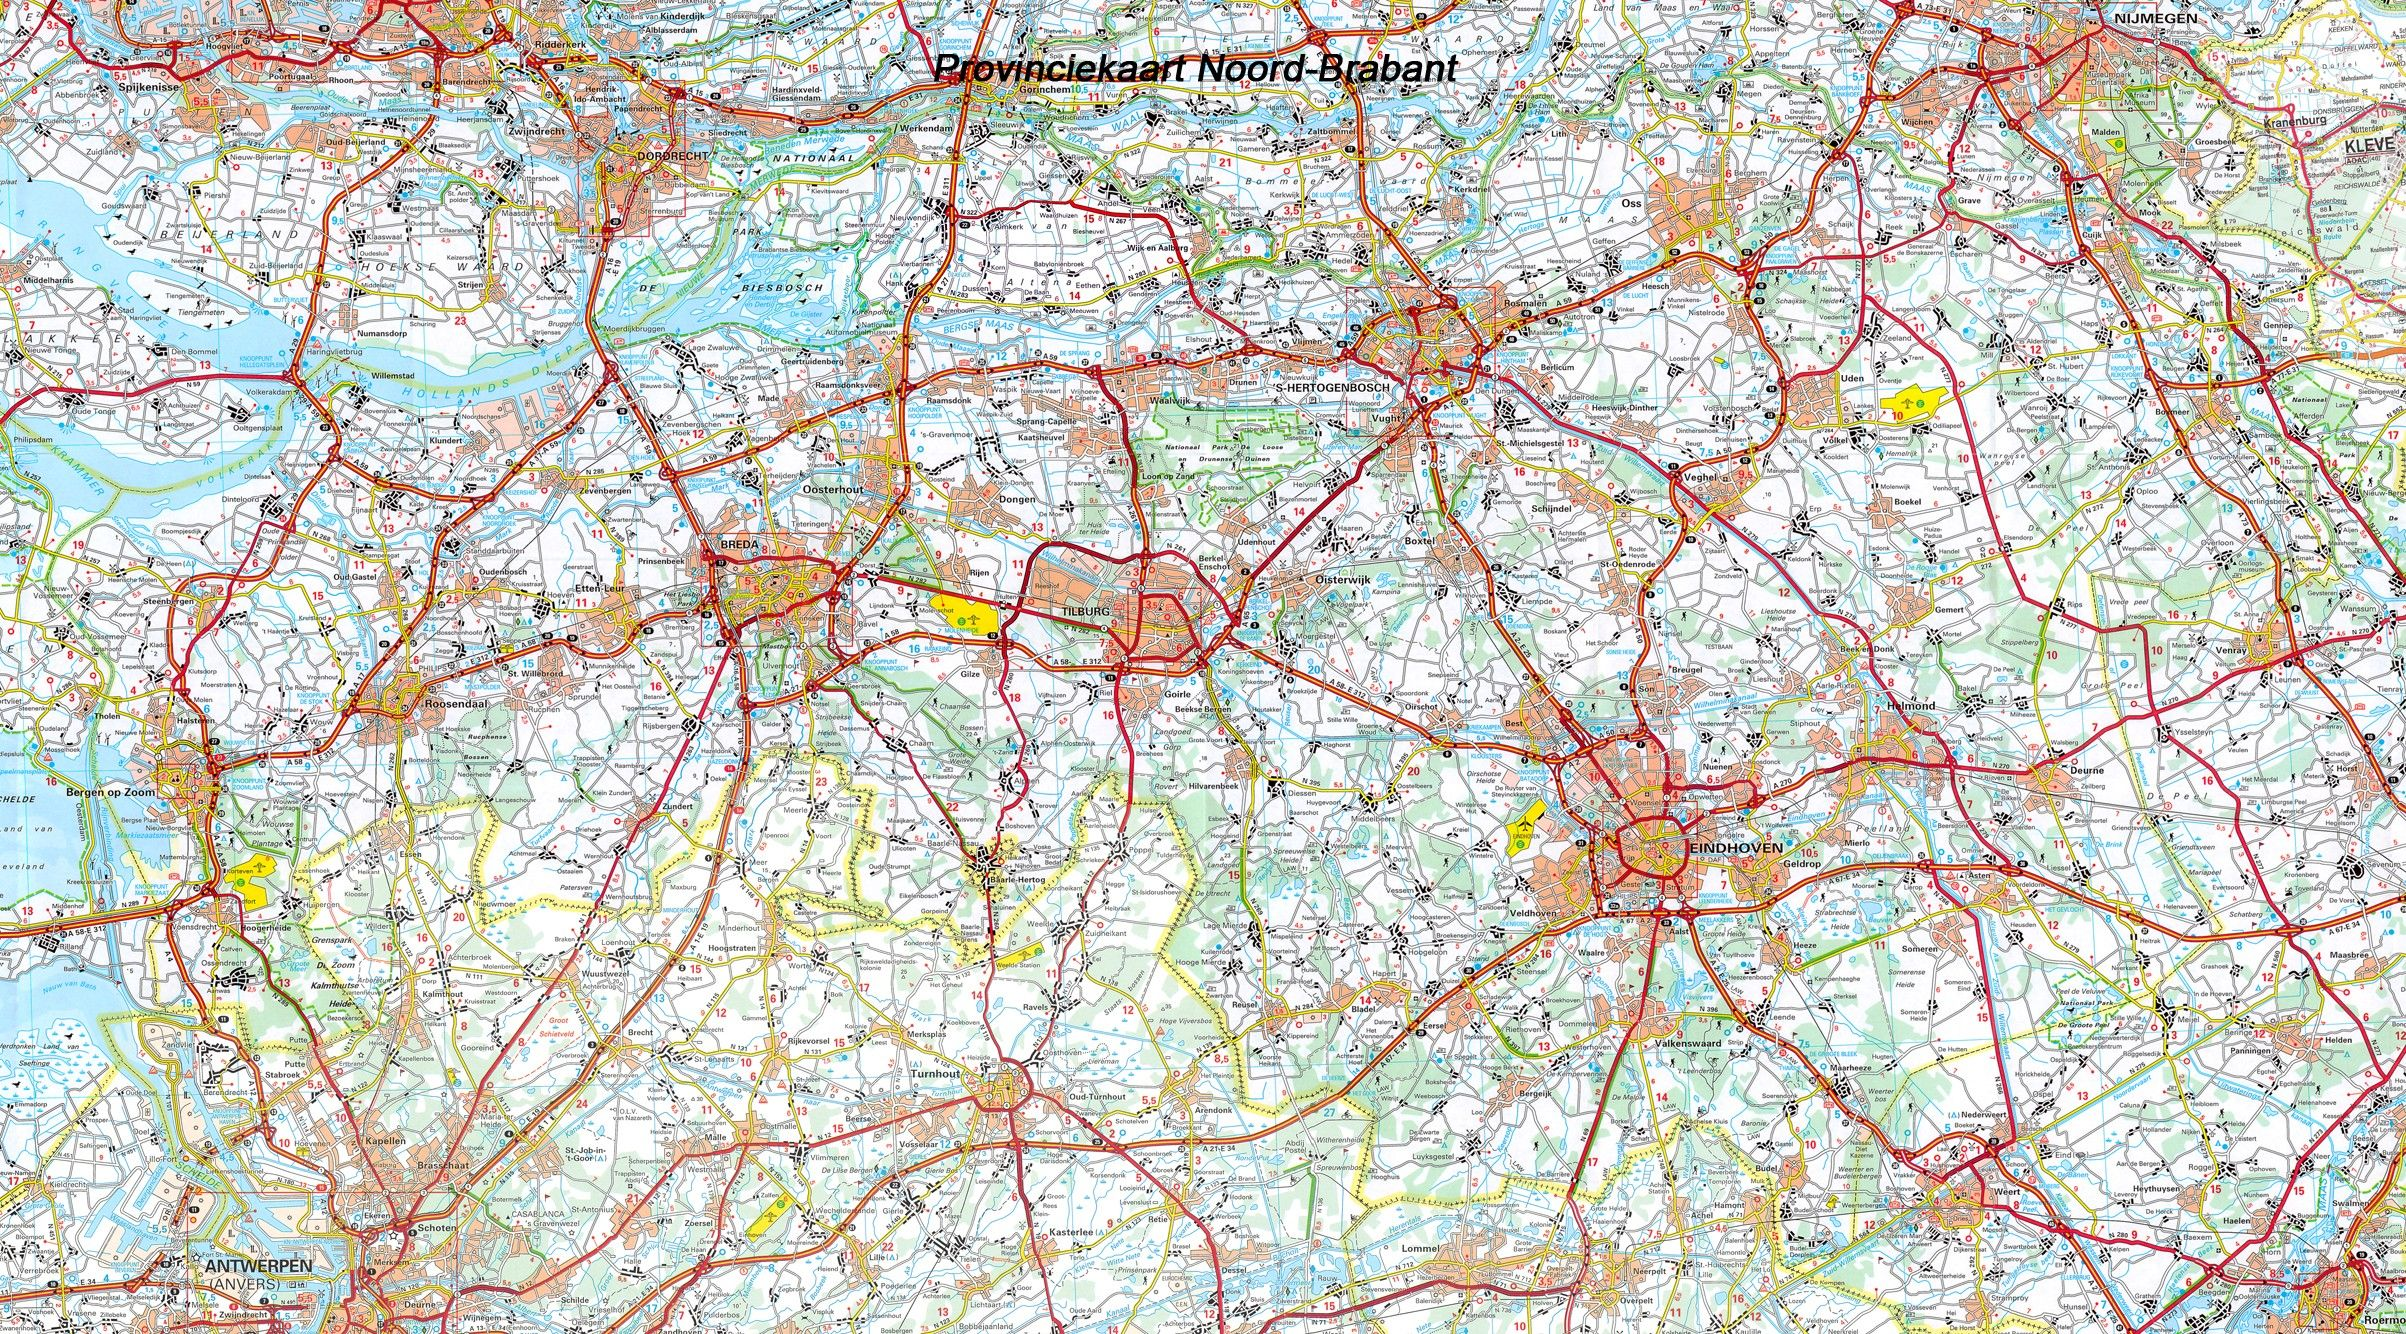 Provincie kaart Noord Brabant 1:100.000